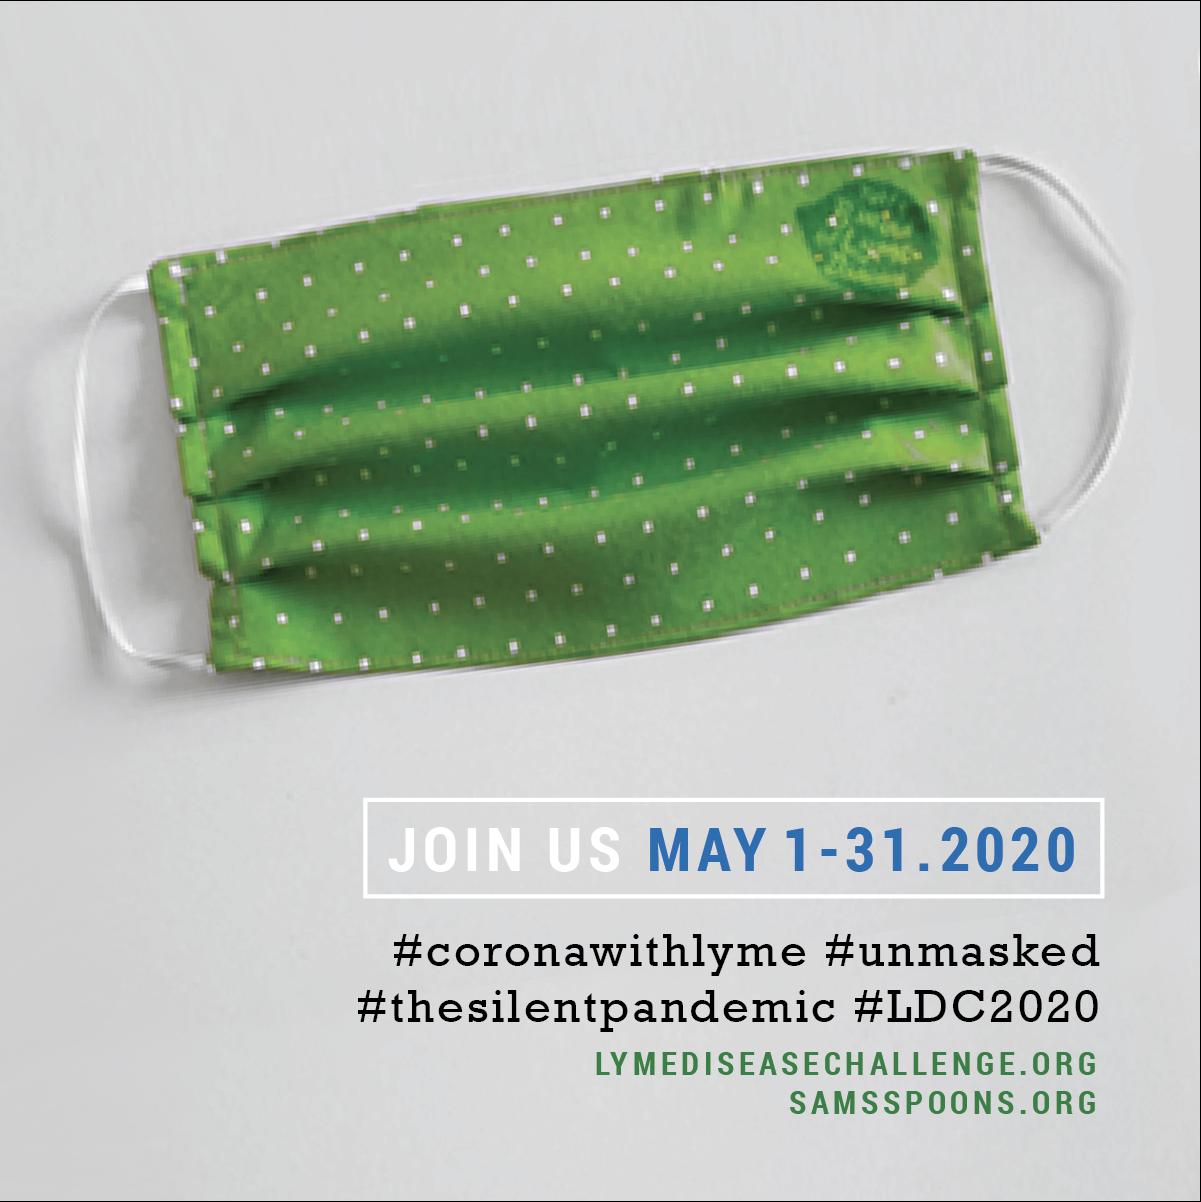 Lyme Disease Challenge